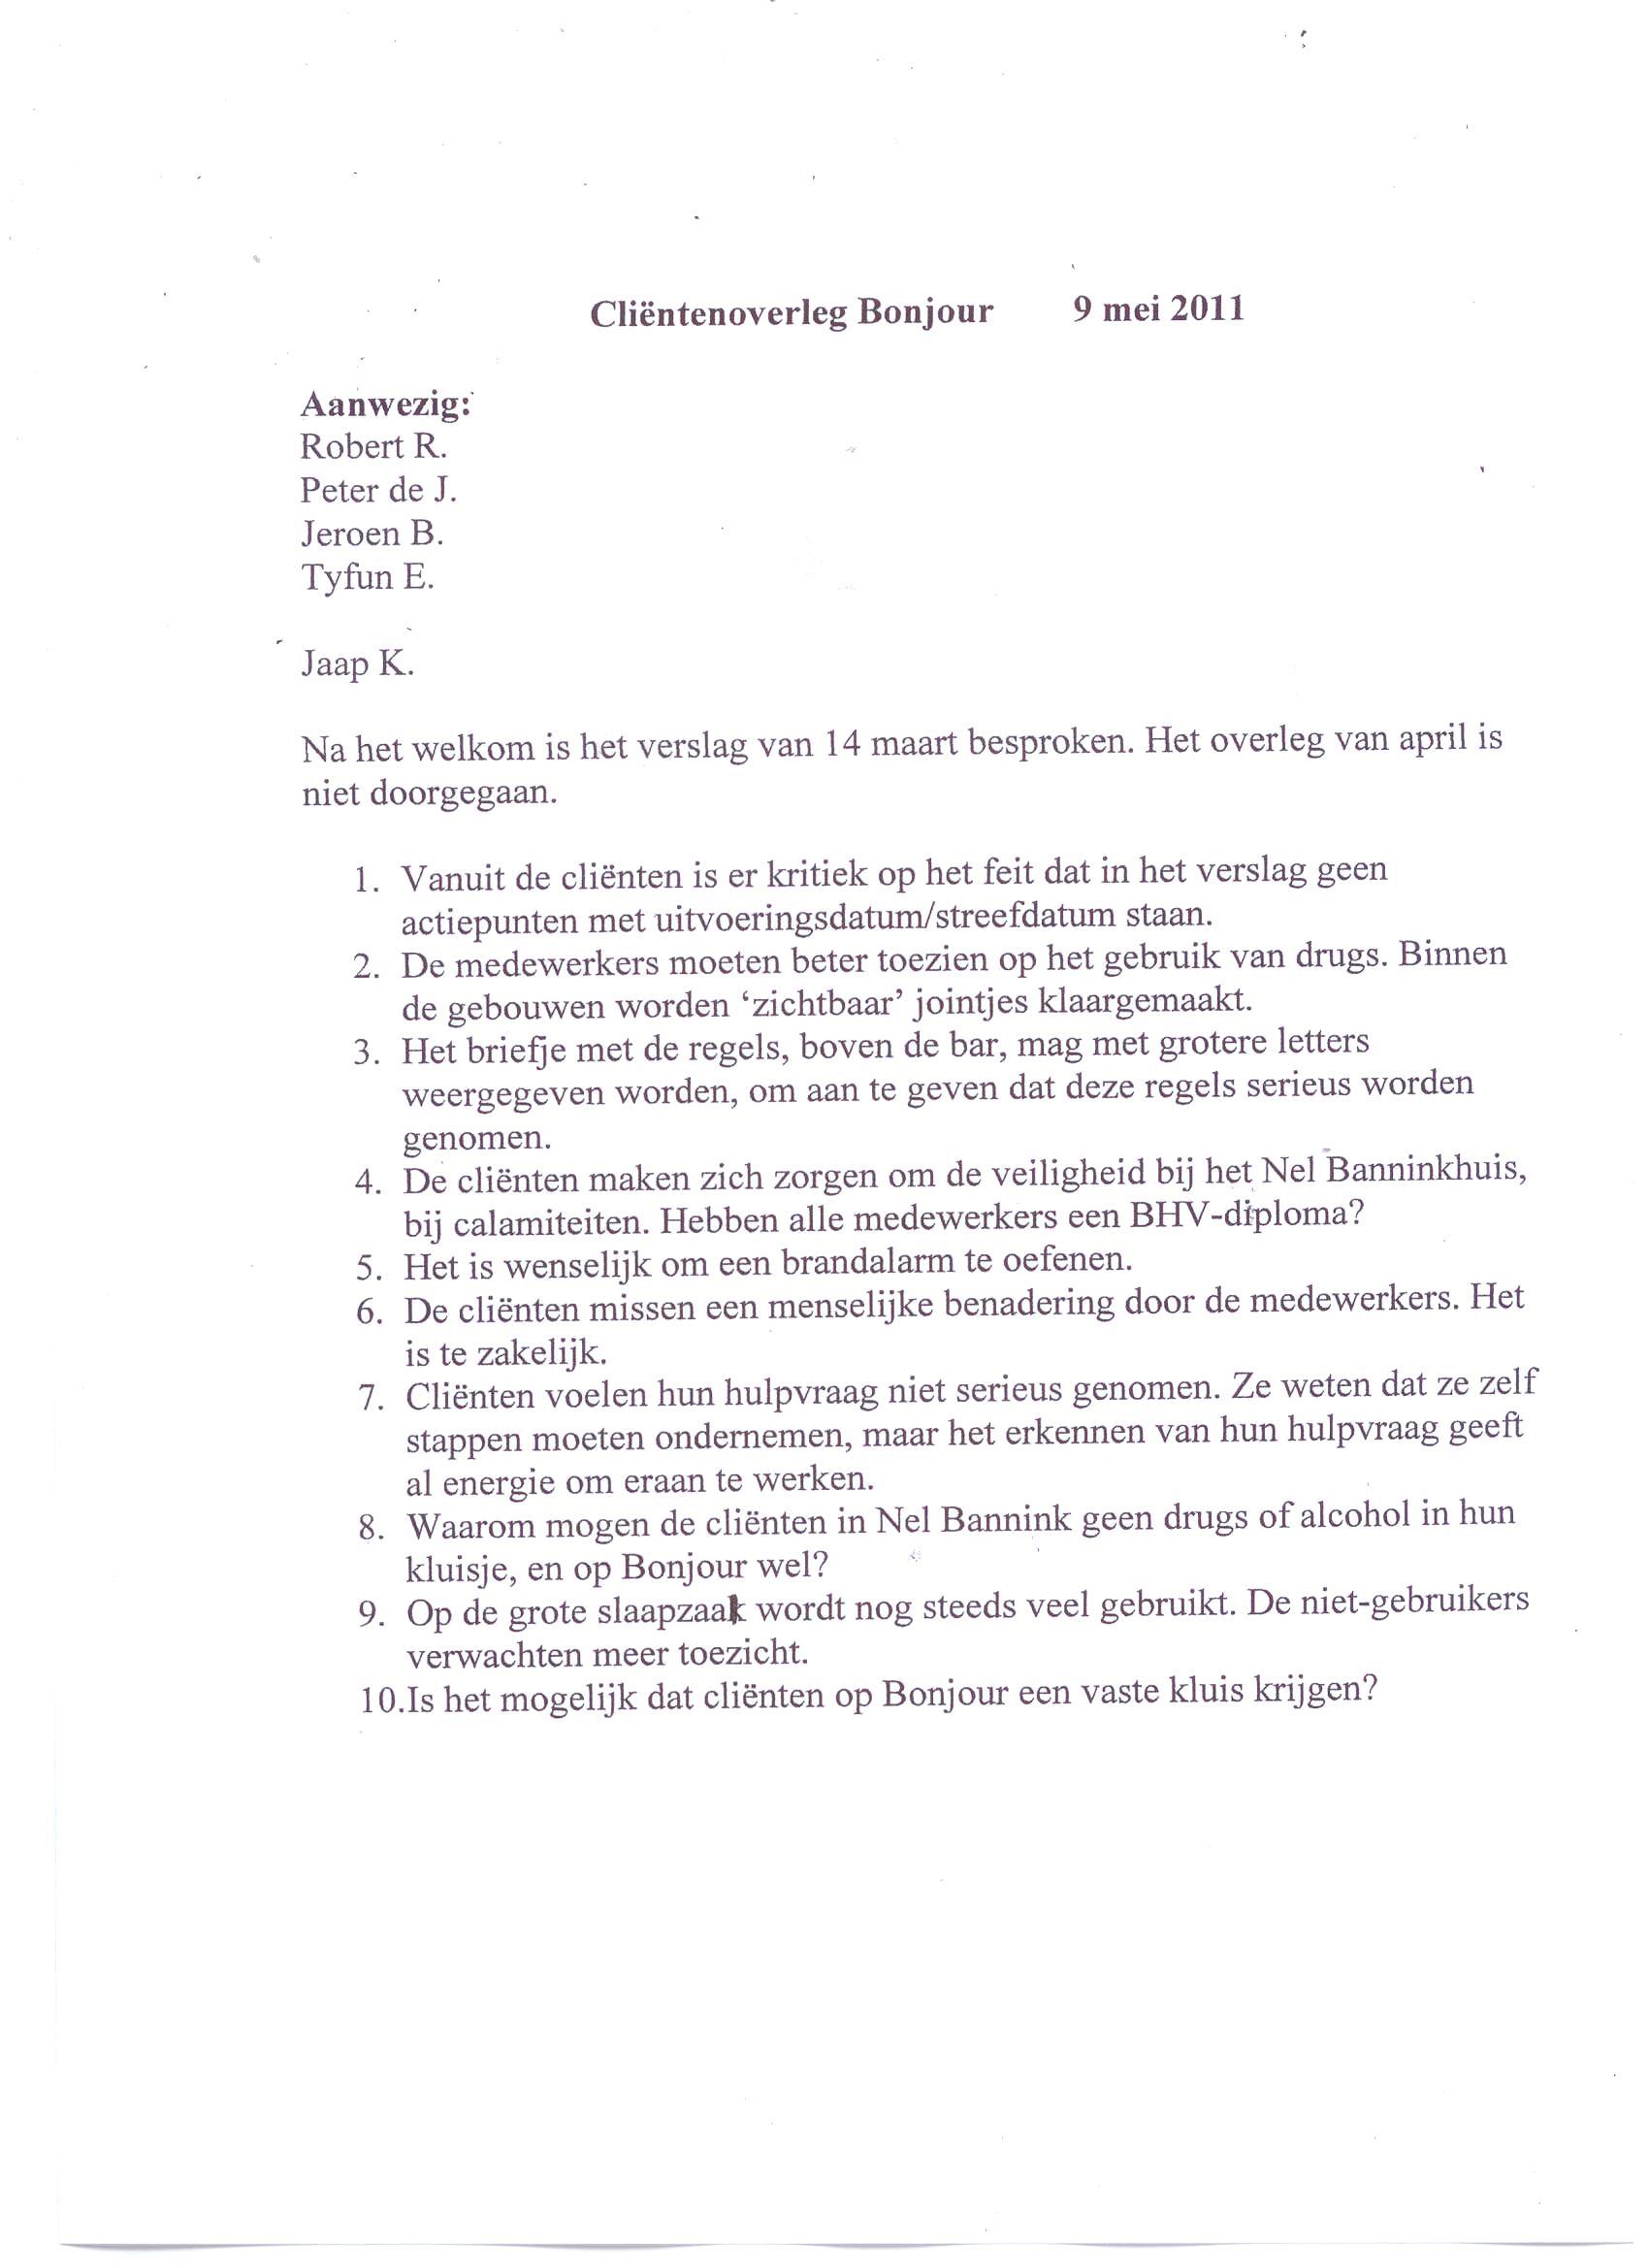 opstelling klachtenbrief Opstelling Klachtenbrief | gantinova